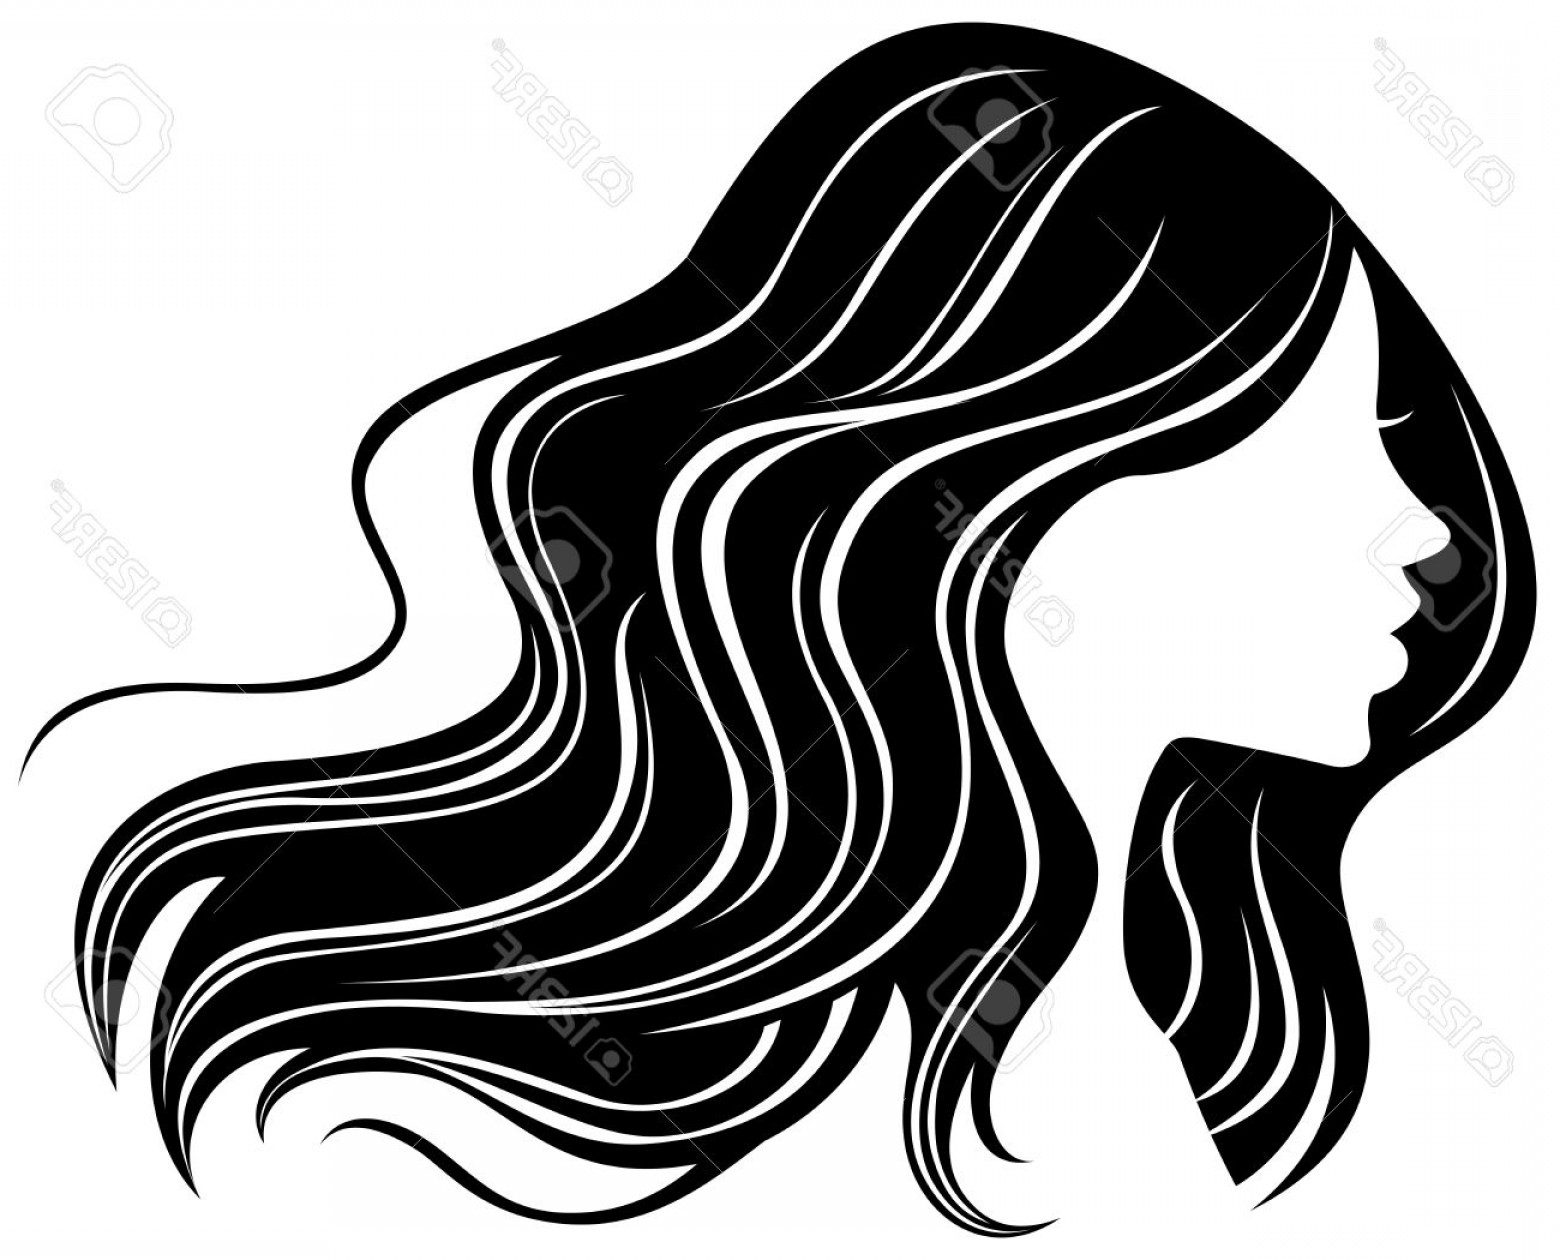 Woman hair silhouette clipart jpg free Photostock Vector Woman Face Silhouette With Wavy Hair ... jpg free